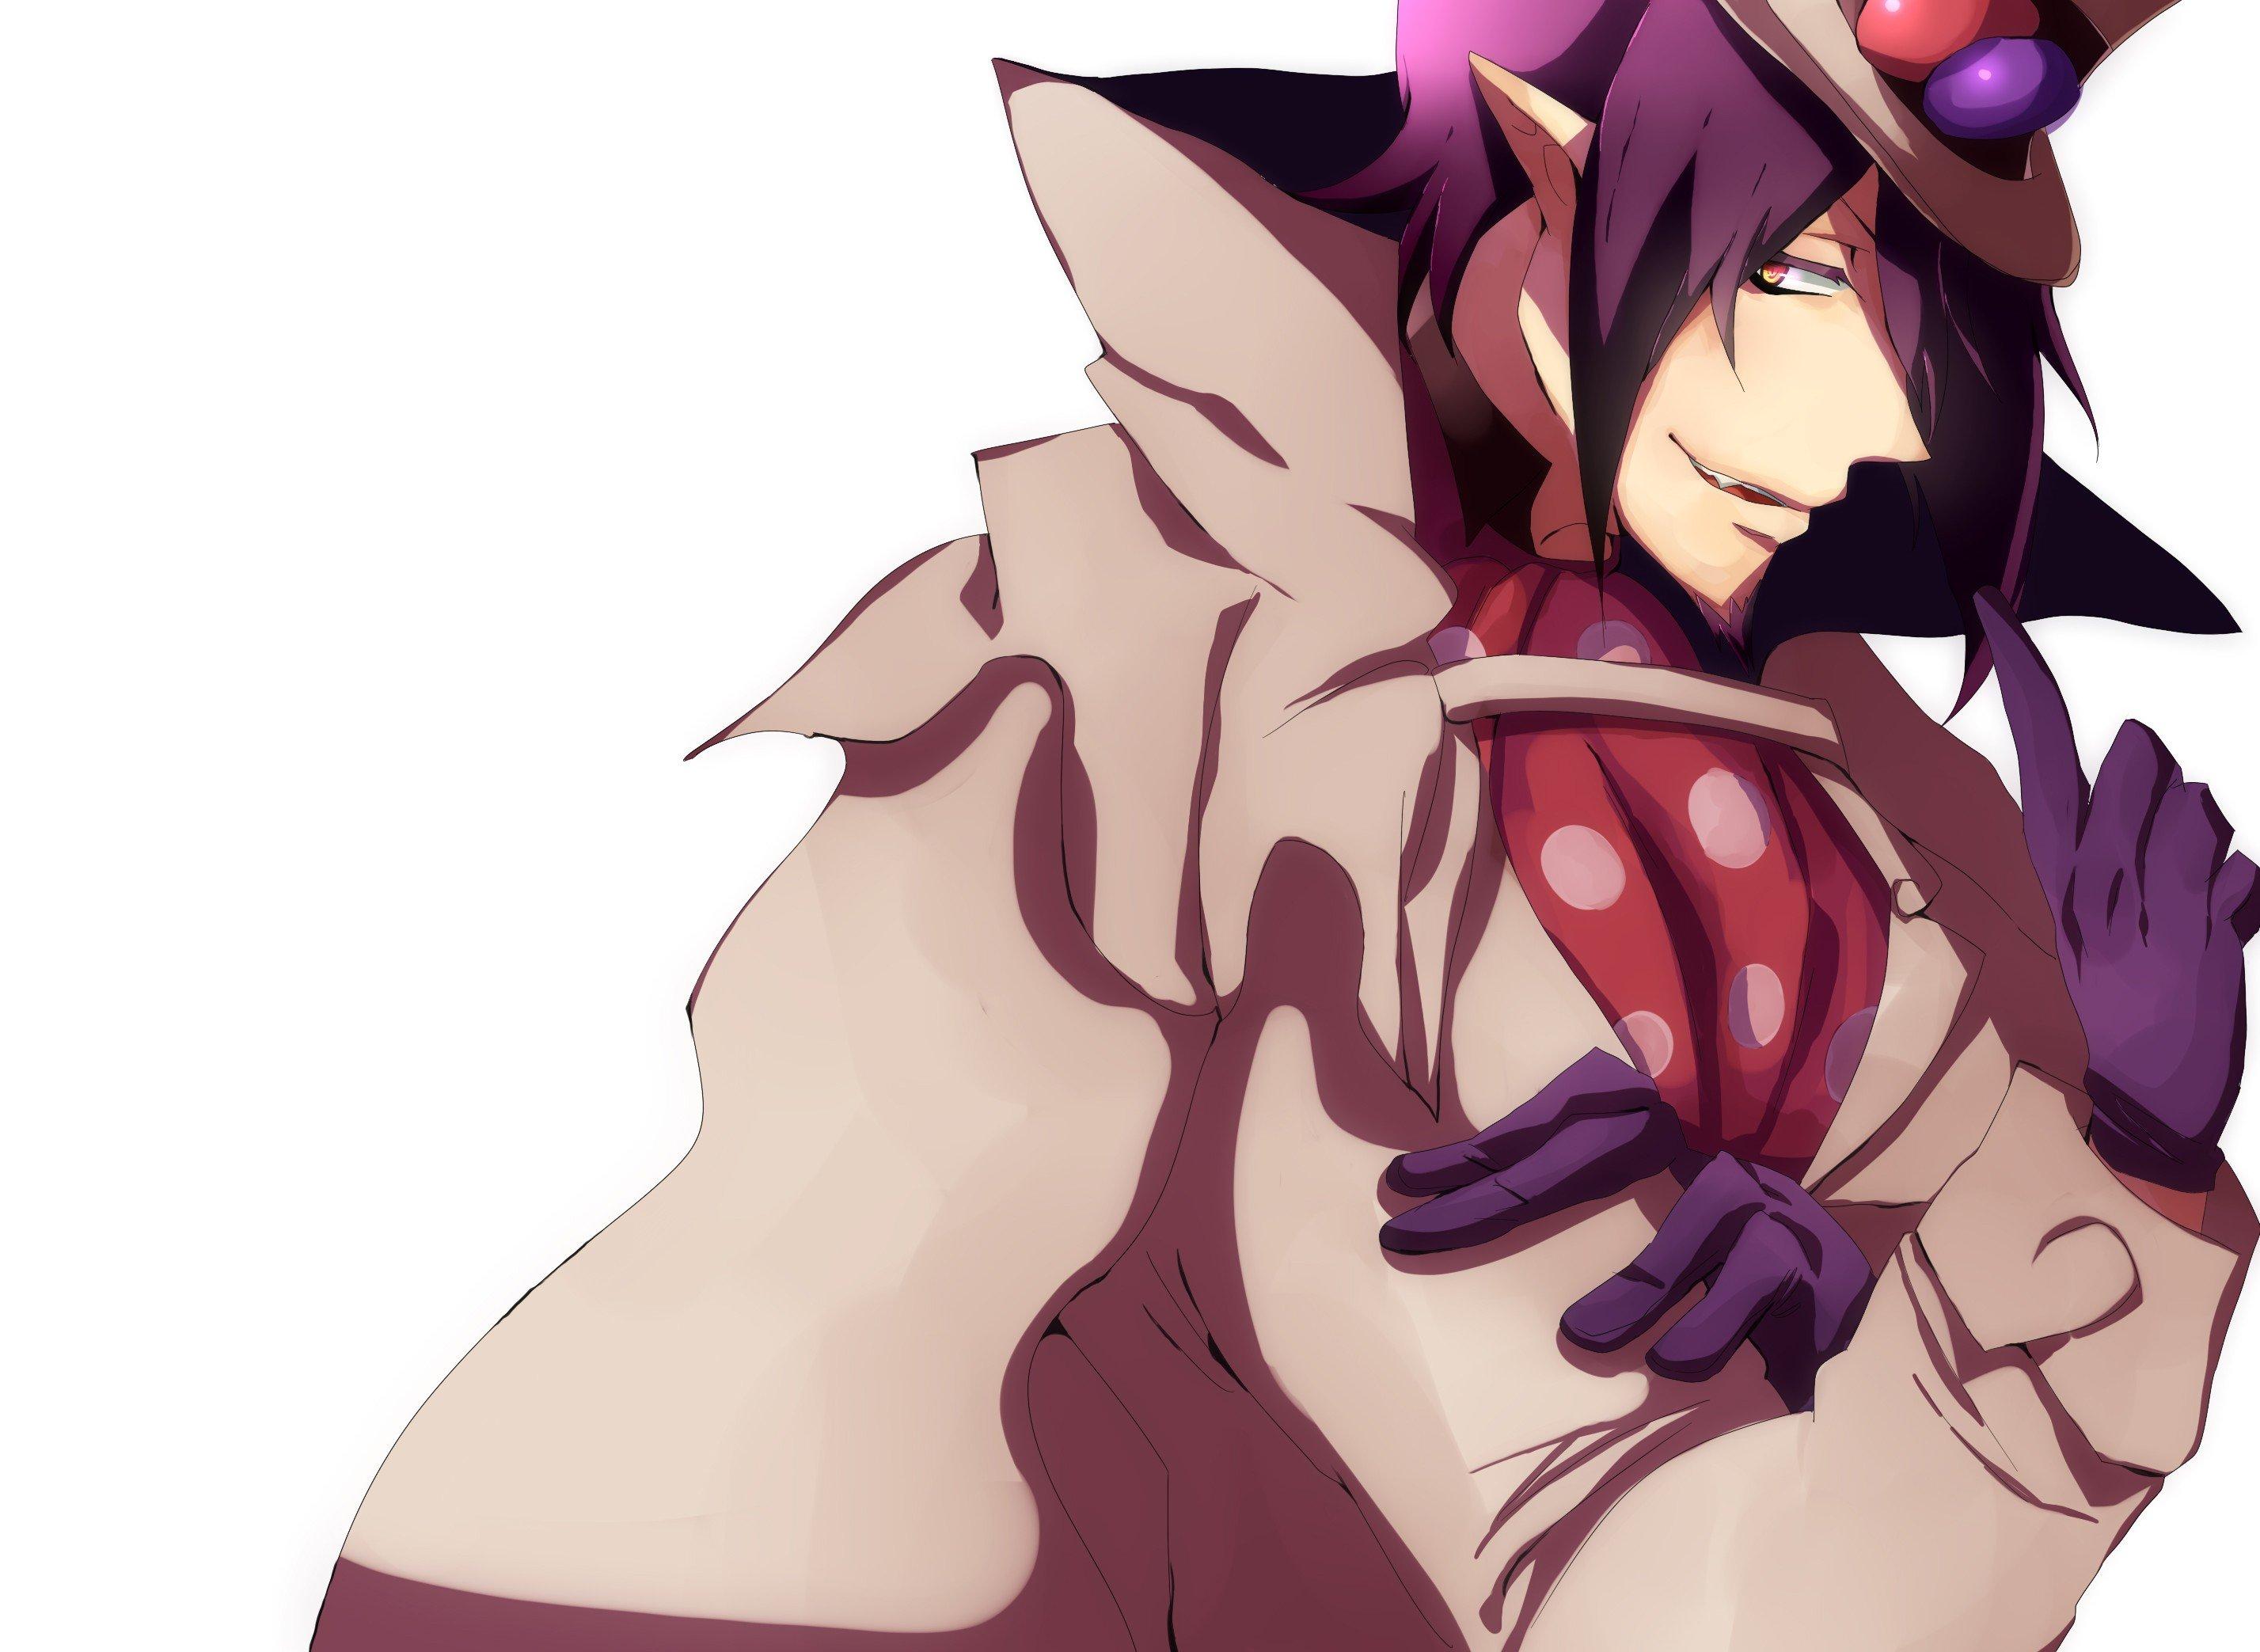 Gloves Purple Hair Beard Anime Boys Ao No Exorcist Mephisto Pheles Hats Wallpaper